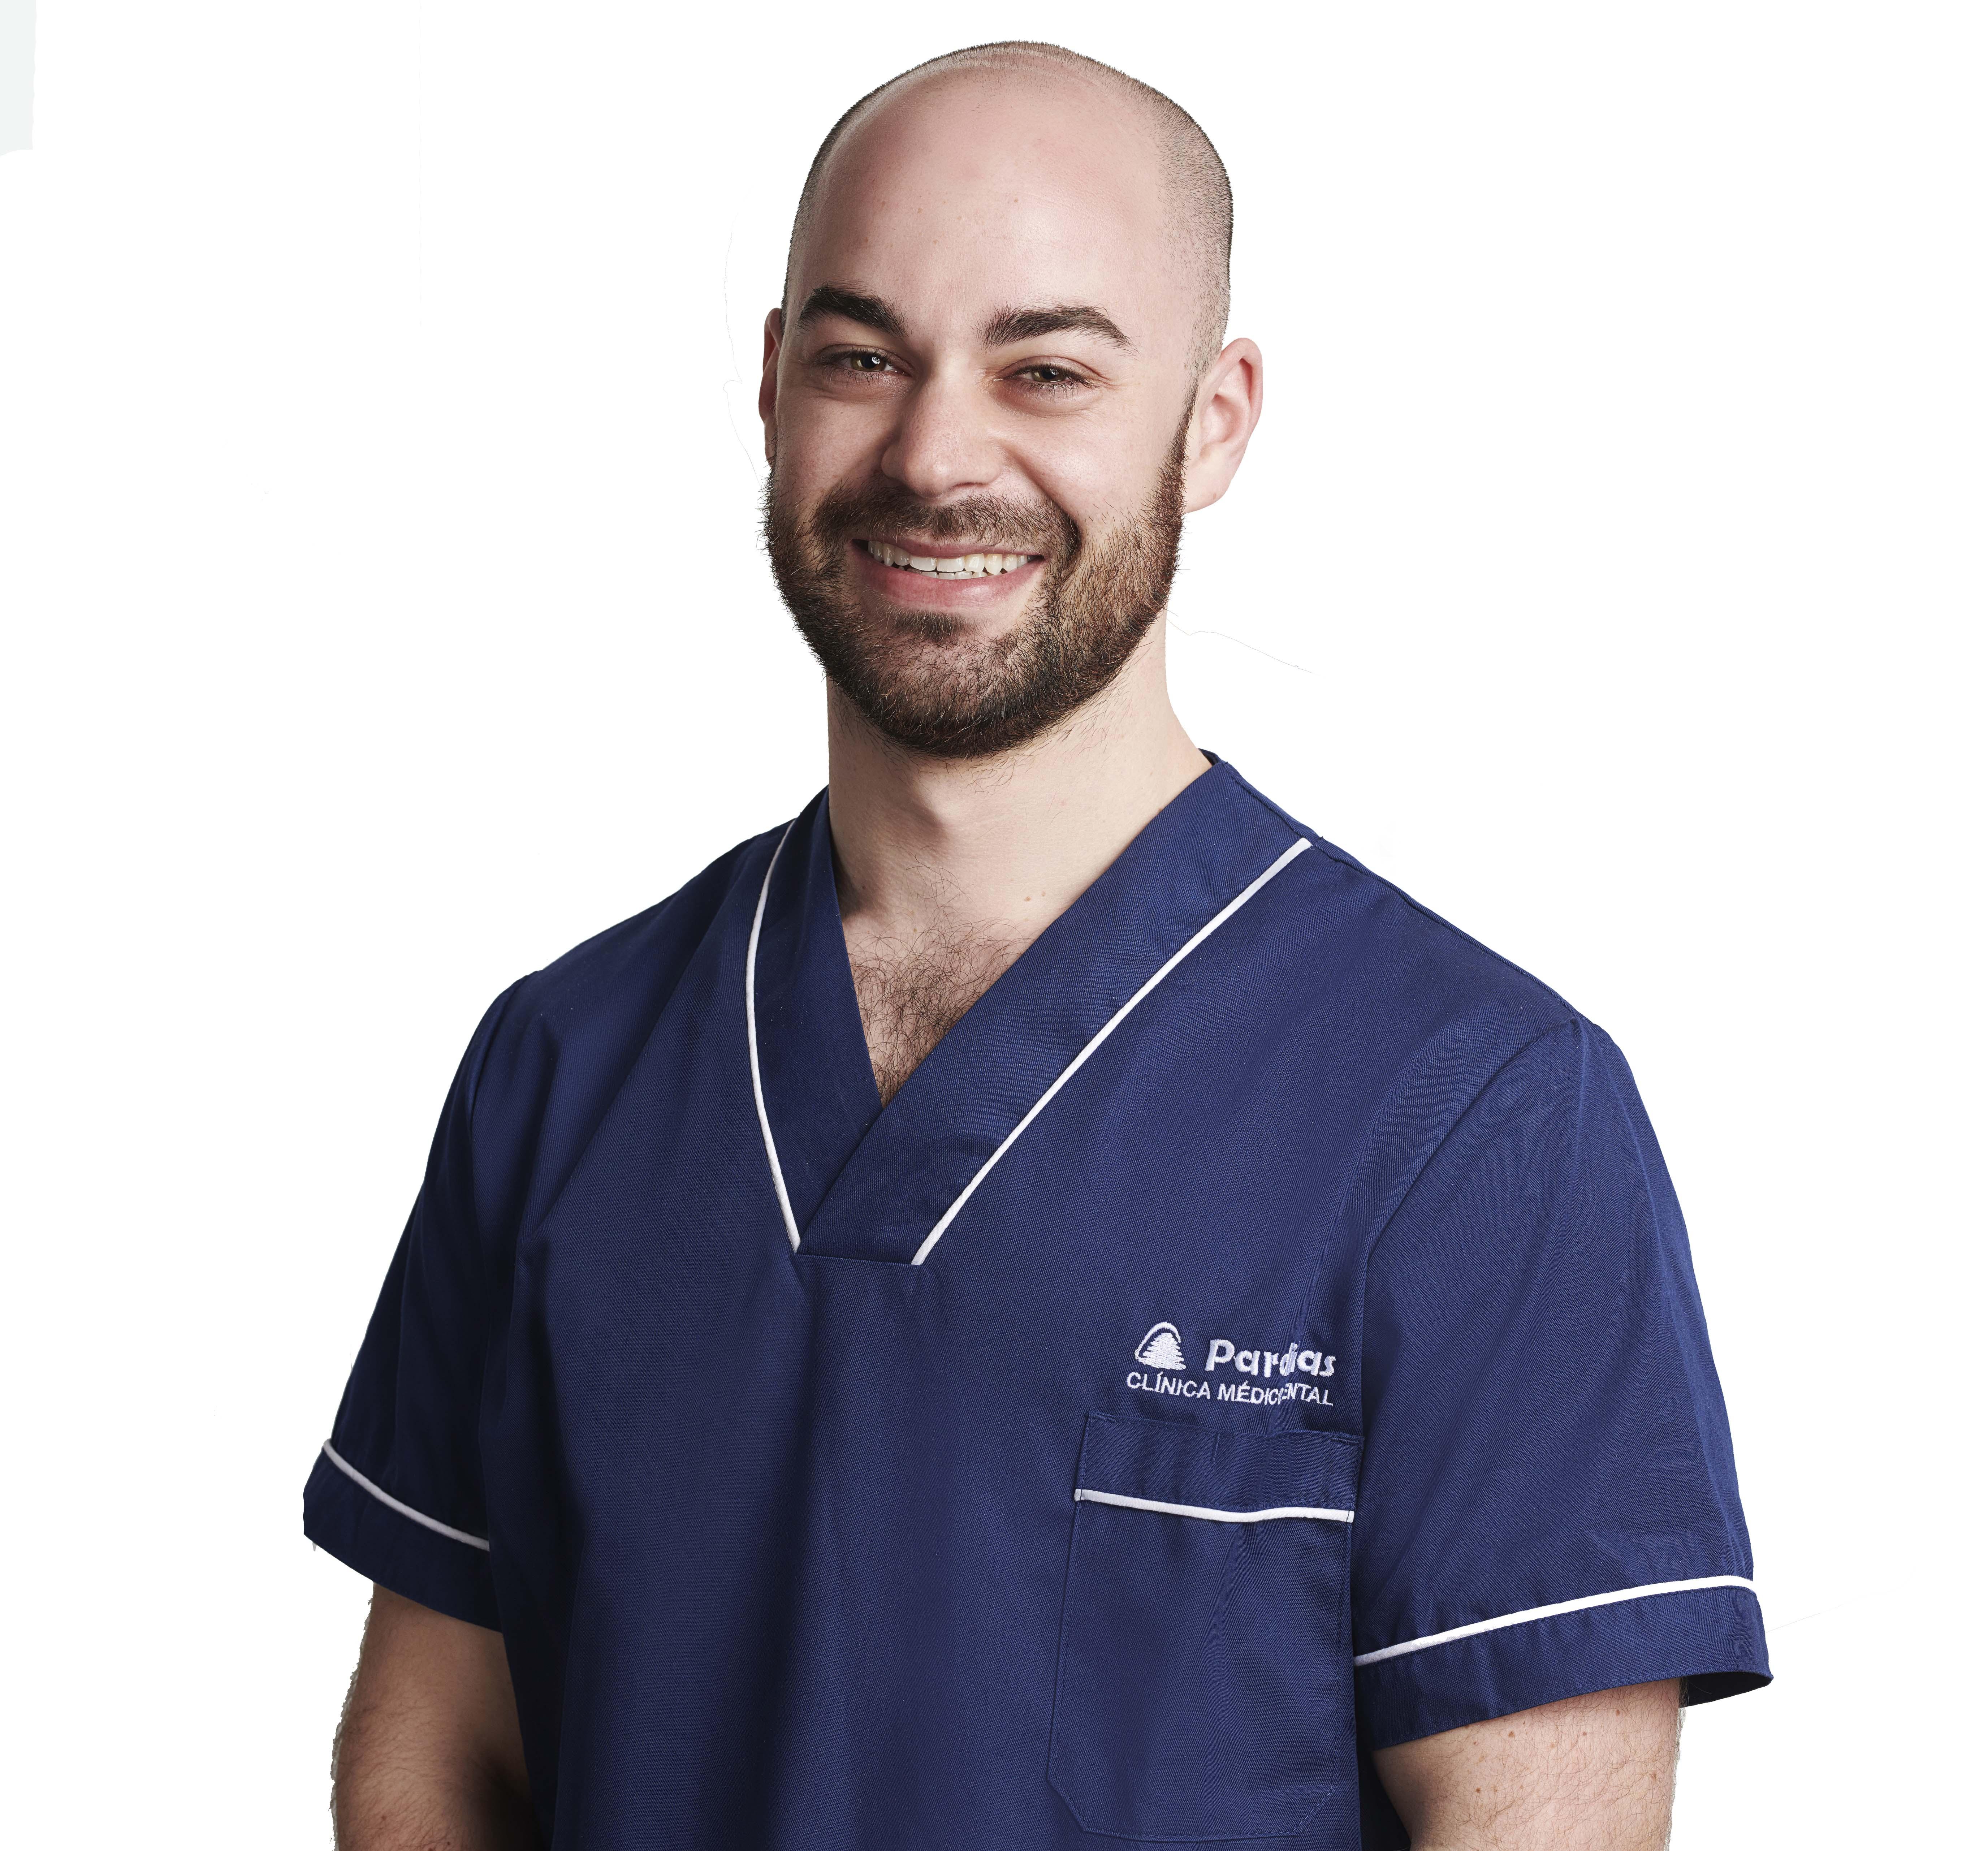 Dr. Roberto Pernas García: Doctor in Dental Surgery